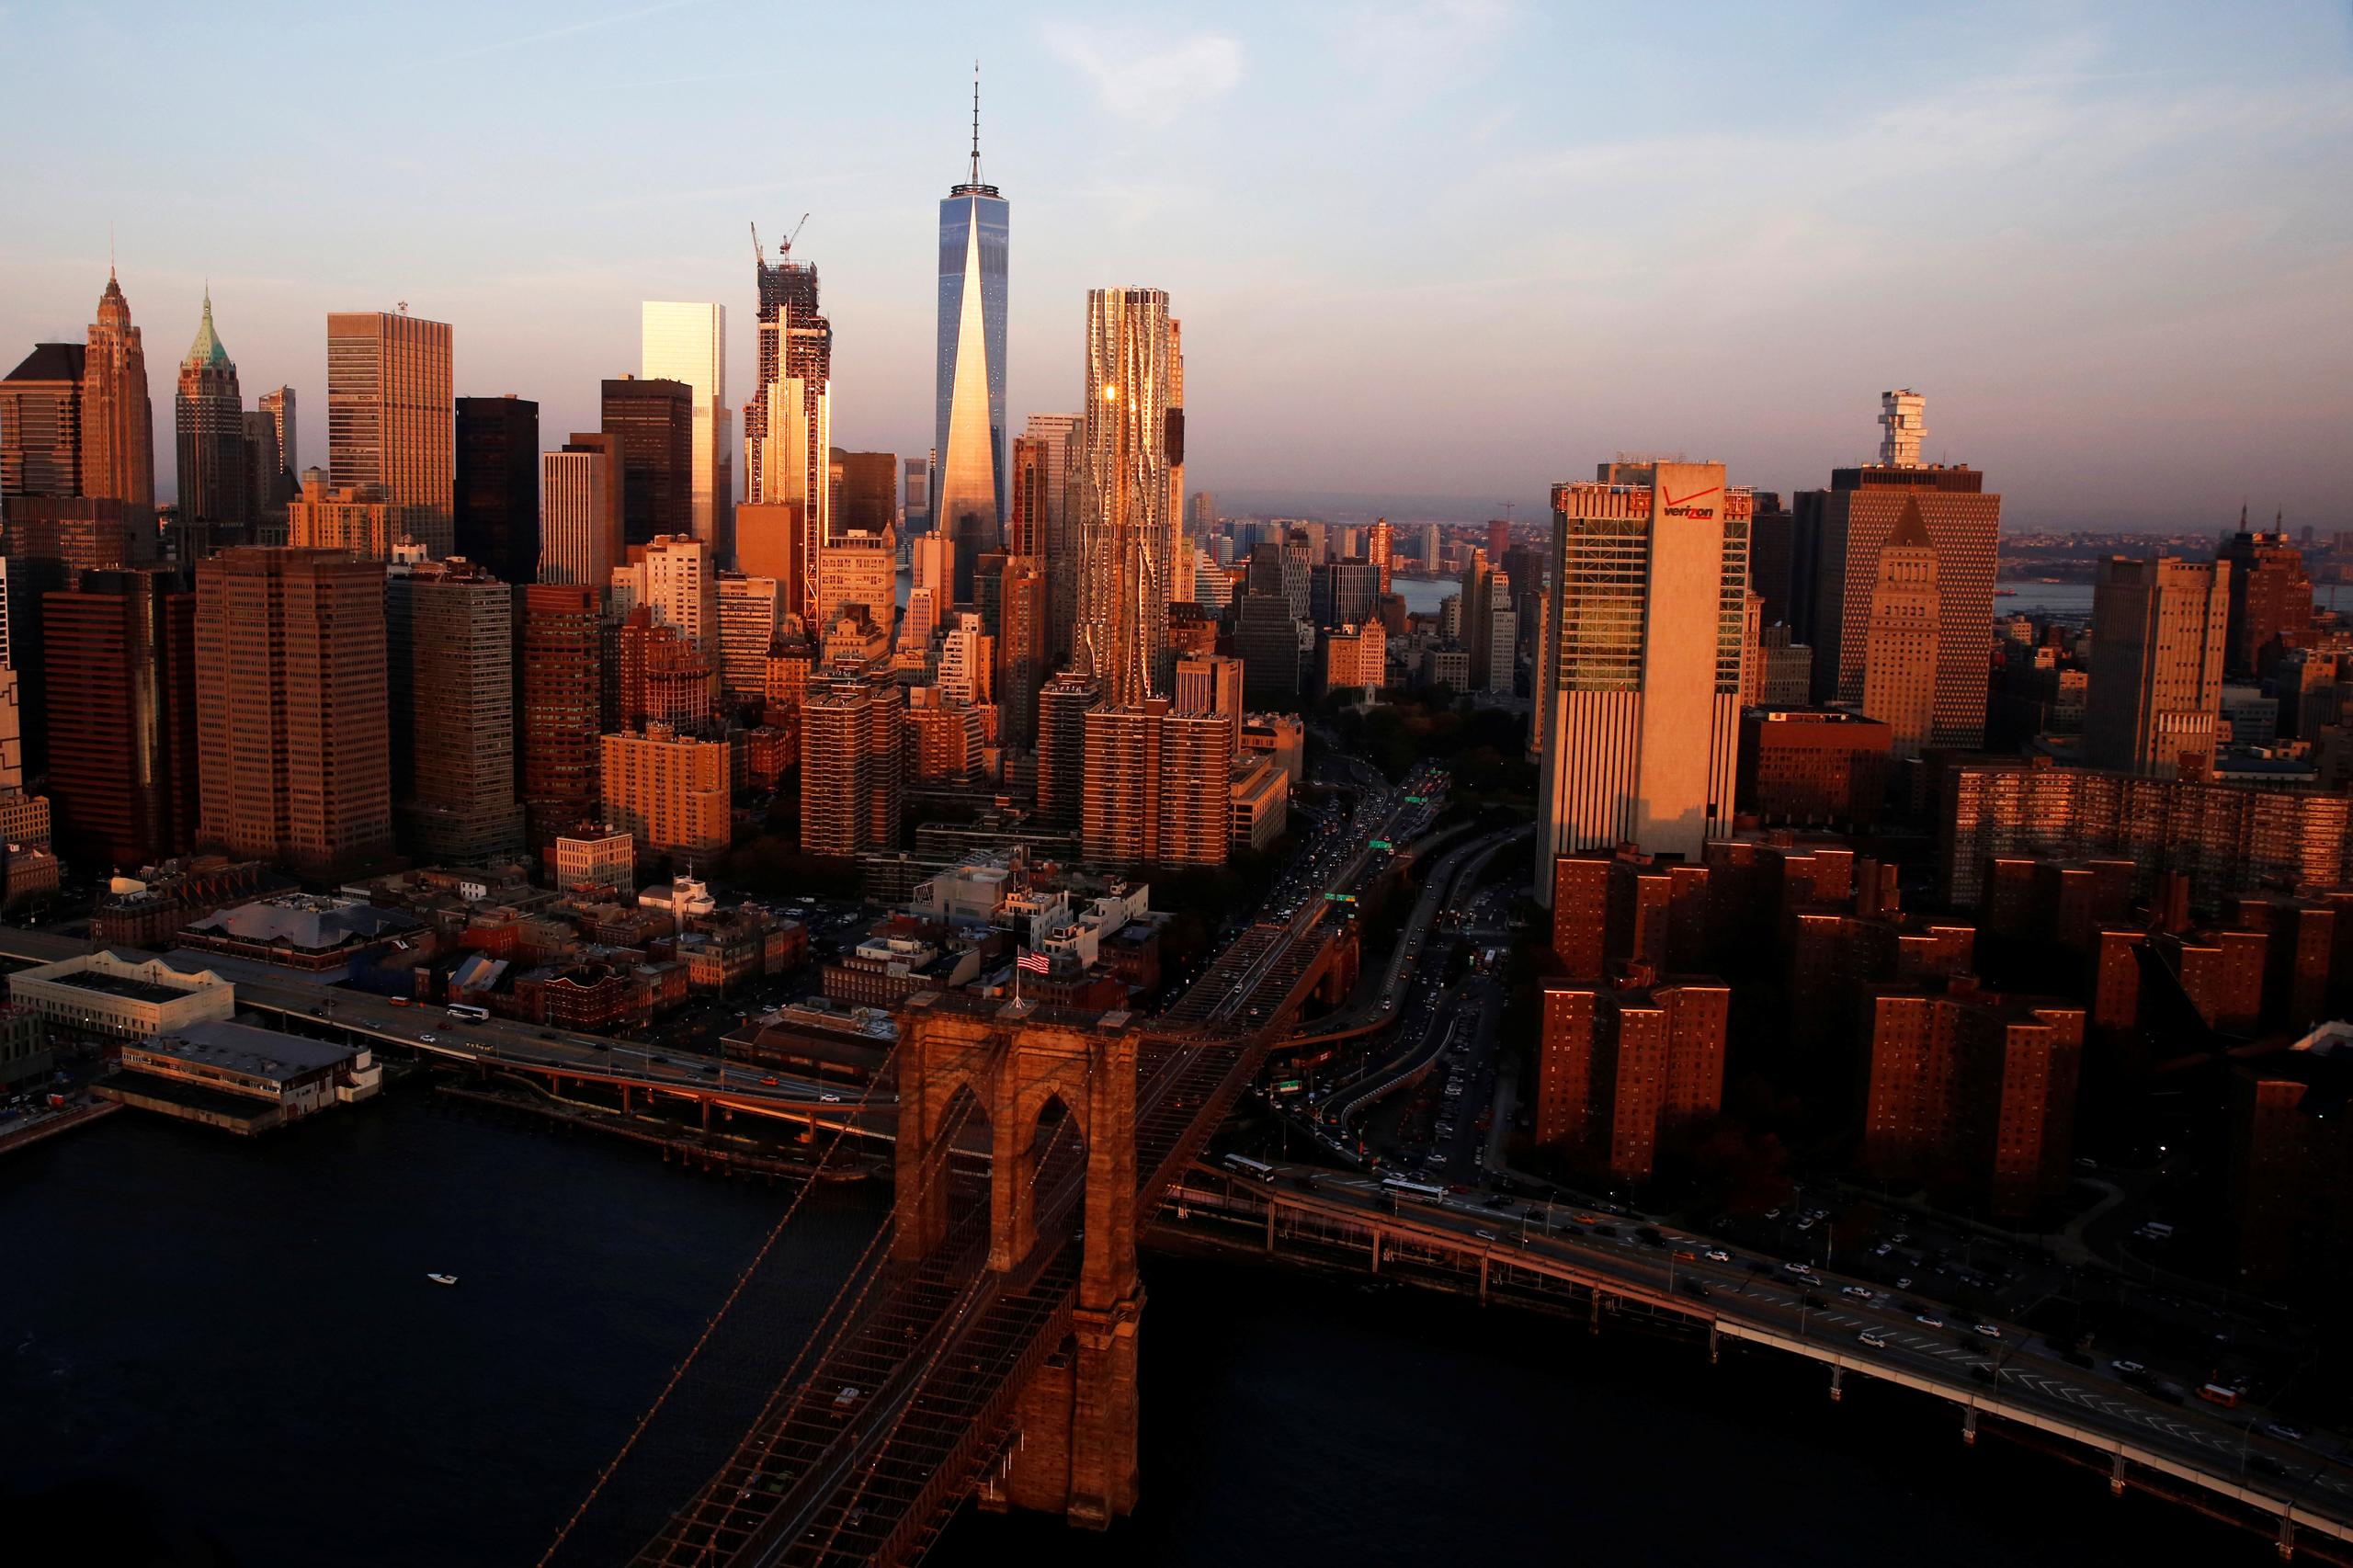 The rising sun lights the Brooklyn Bridge and One World Trade in the Manhattan borough of New York City on Nov. 2, 2016.